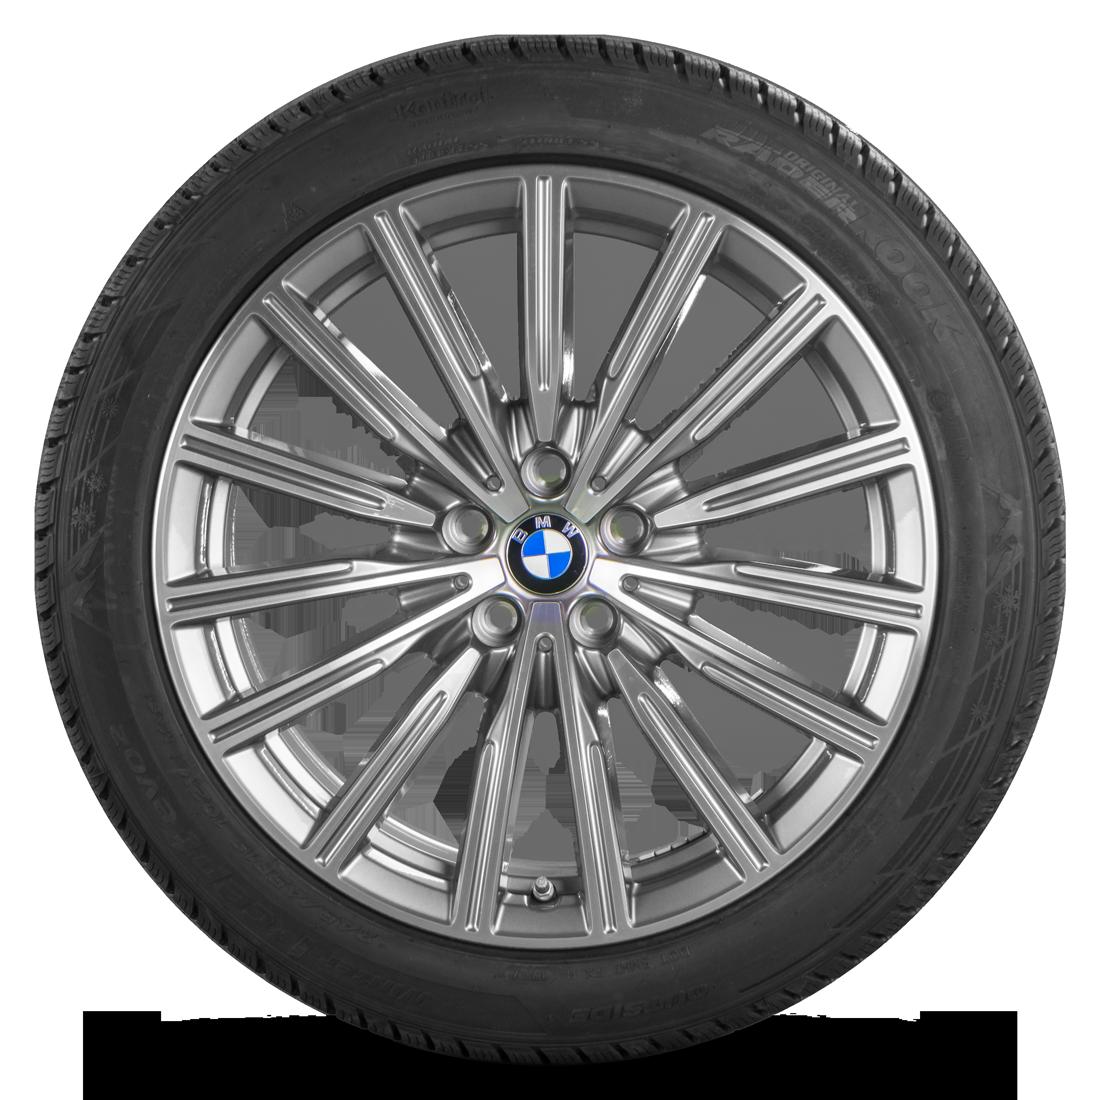 BMW 19 Zoll Felgen 7er G11 G12 6er GT G32 Alufelgen Winterreifen Styling 644